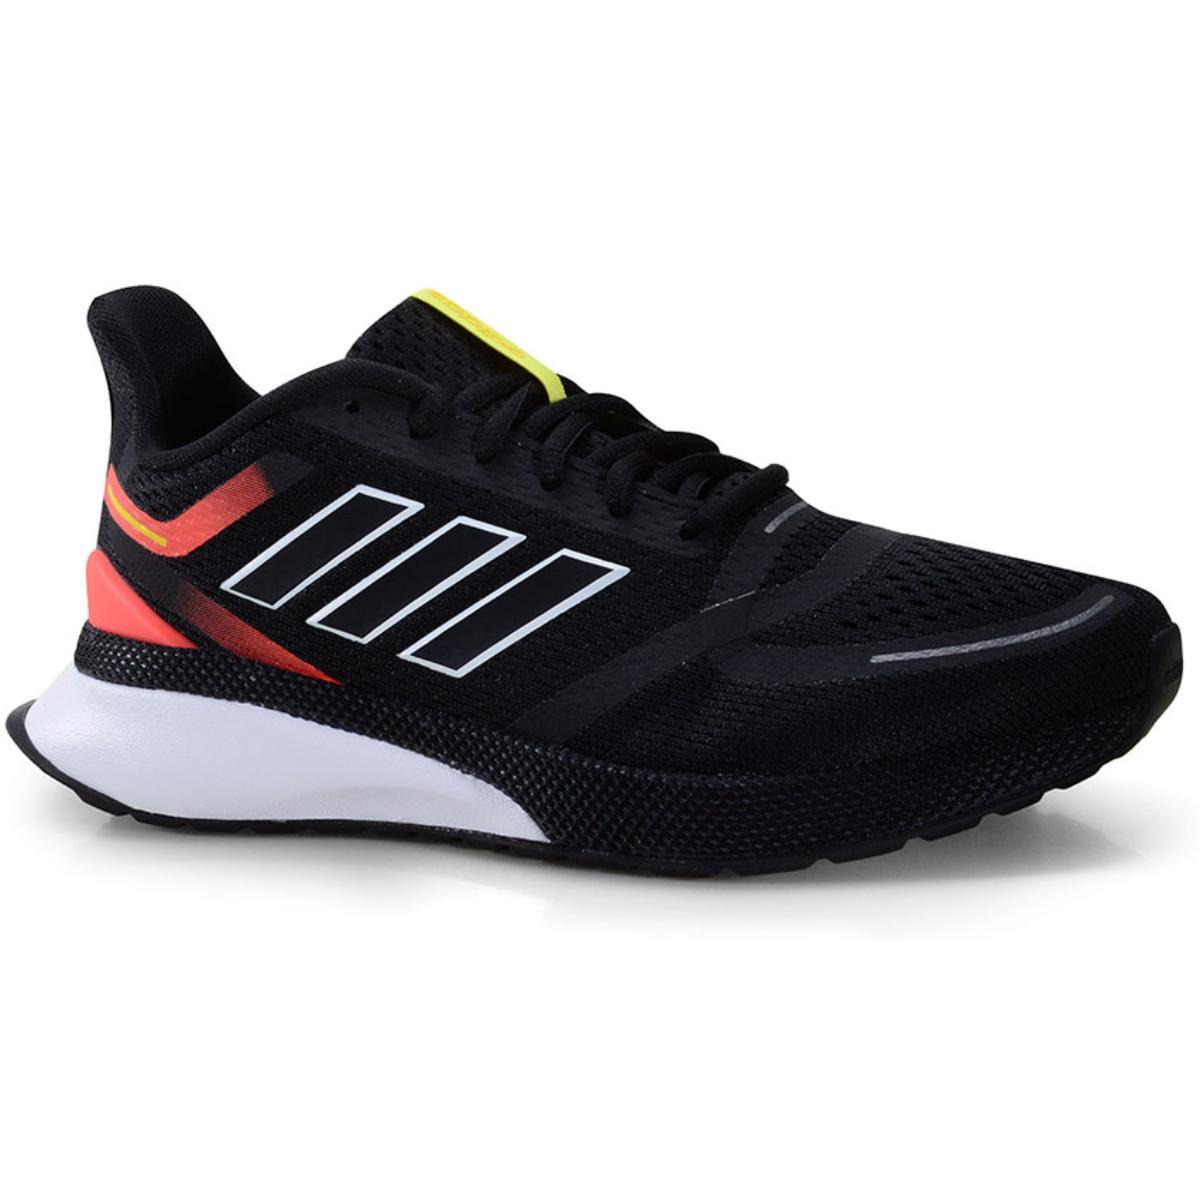 Tênis Masculino Adidas Eg3165 Novafvse m Preto/coral